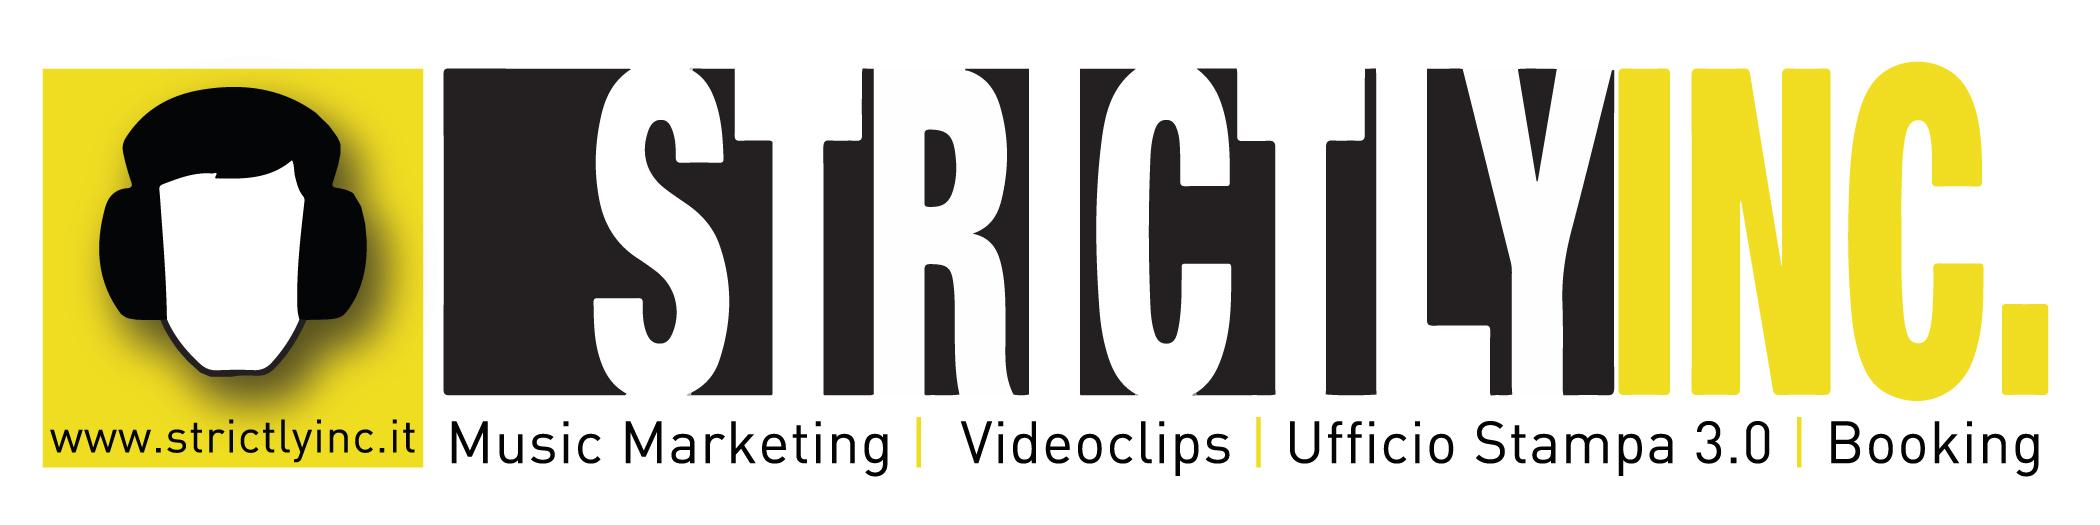 logo_strictlyinc_bianco_2018